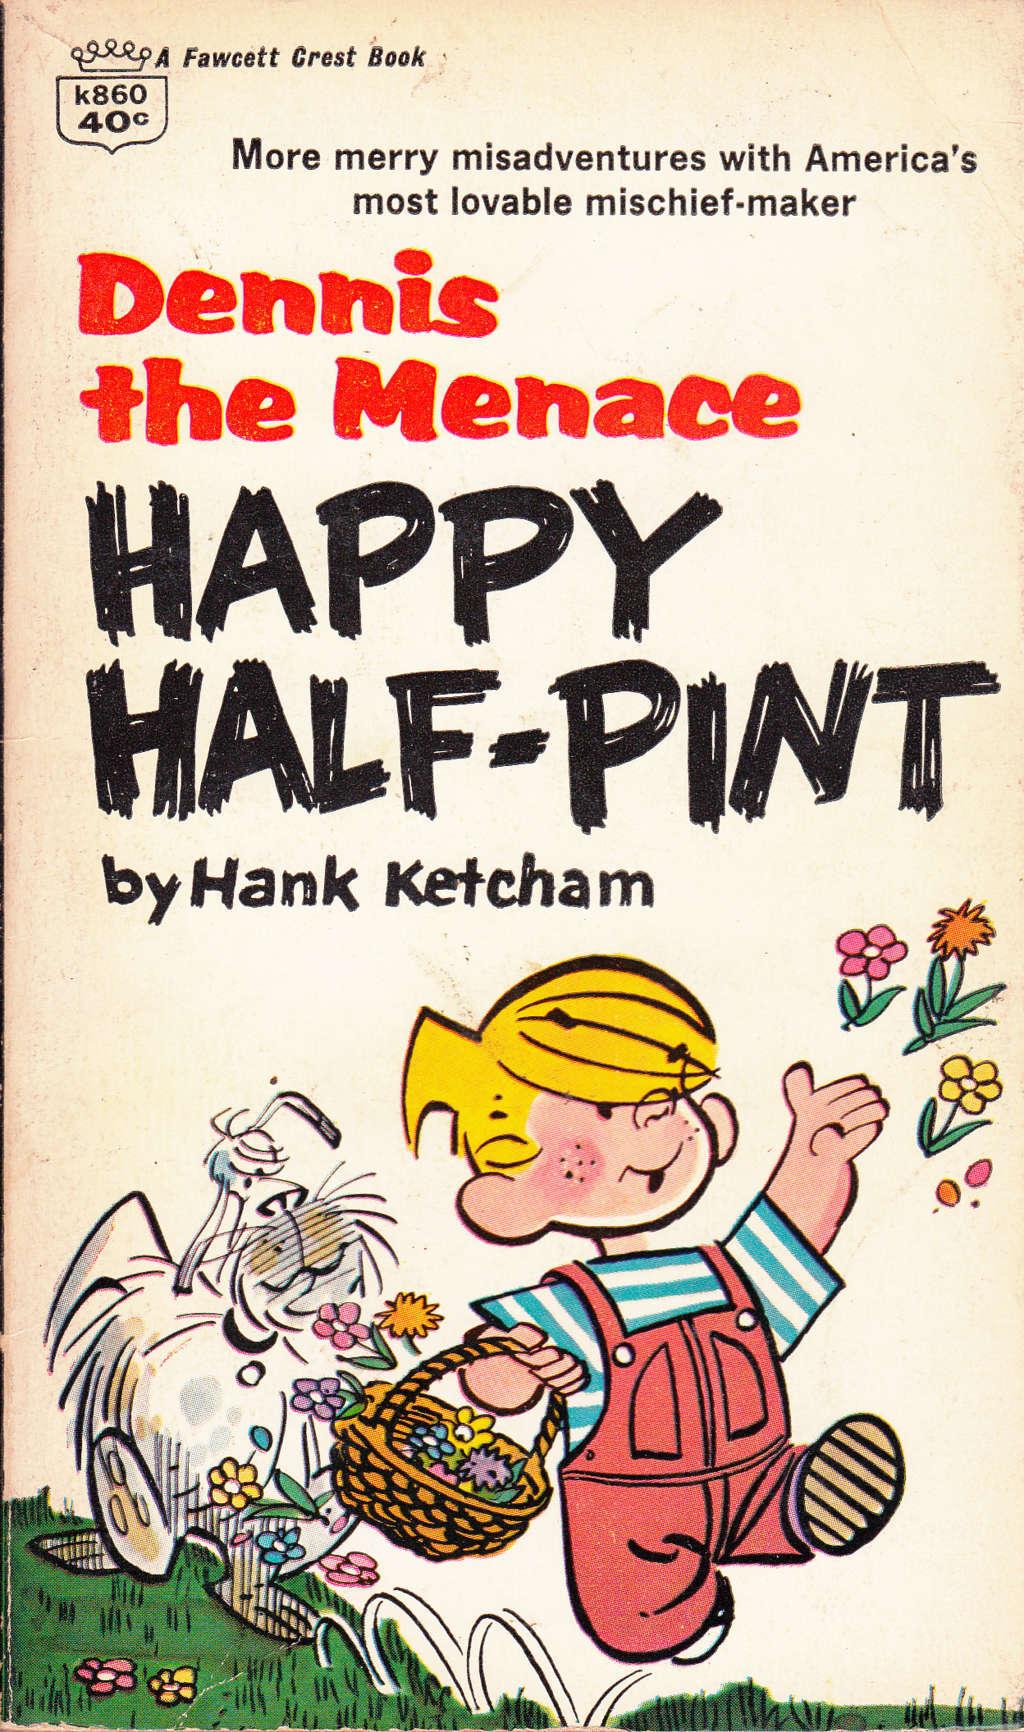 Dennis the Menace, Happy Half-Pint